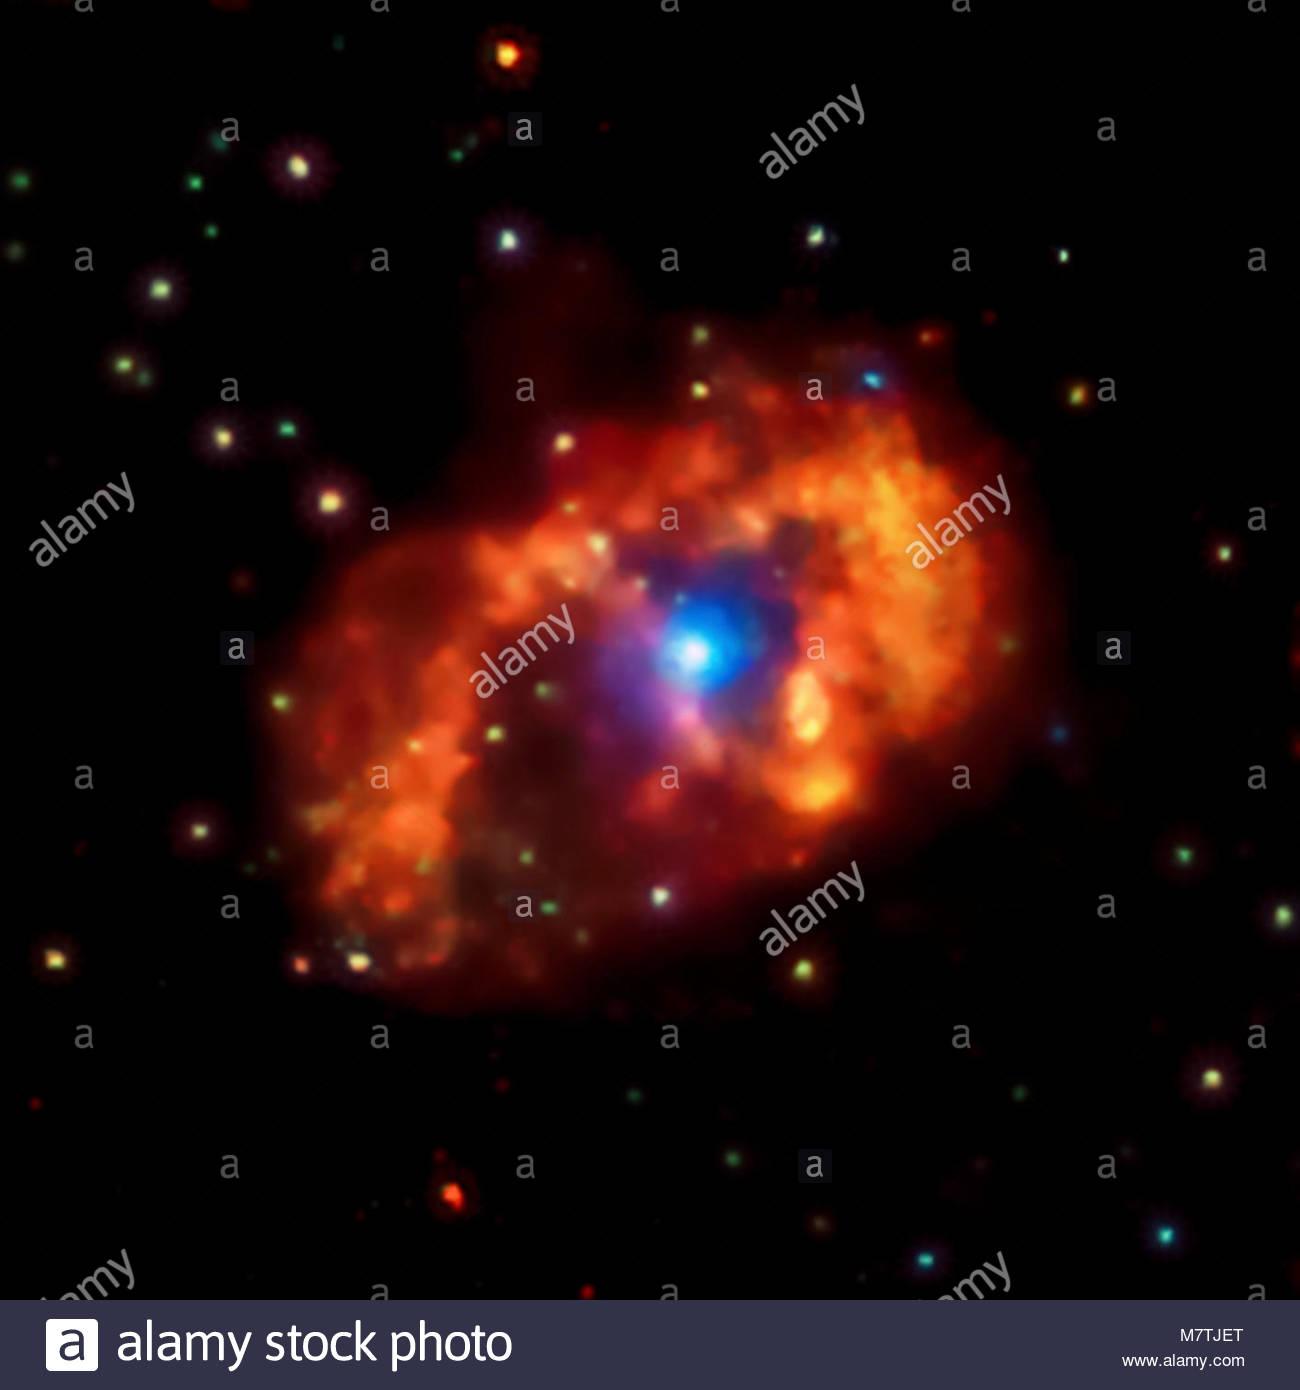 Eta Carinae Star System-Chandra XRay Observatory  Eta